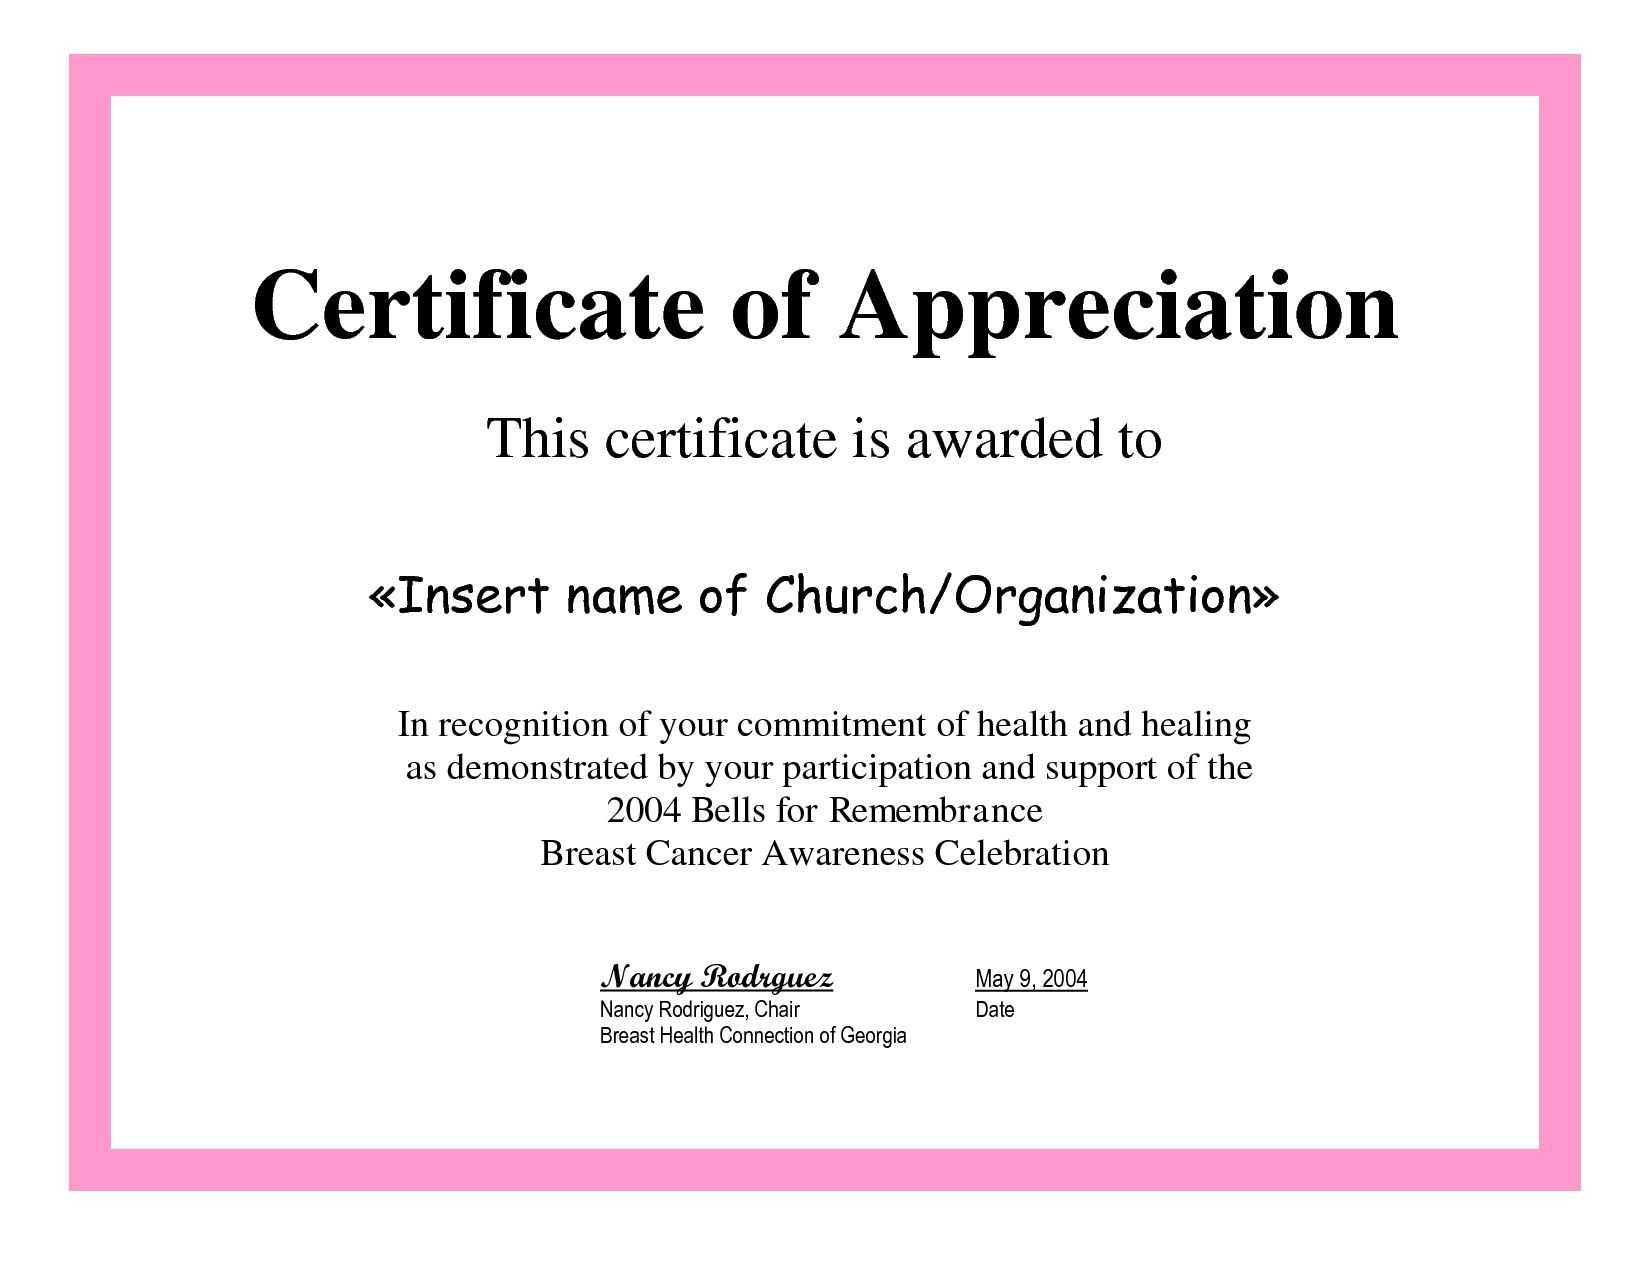 Farewell Certificate Template - Atlantaauctionco In Farewell Certificate Template